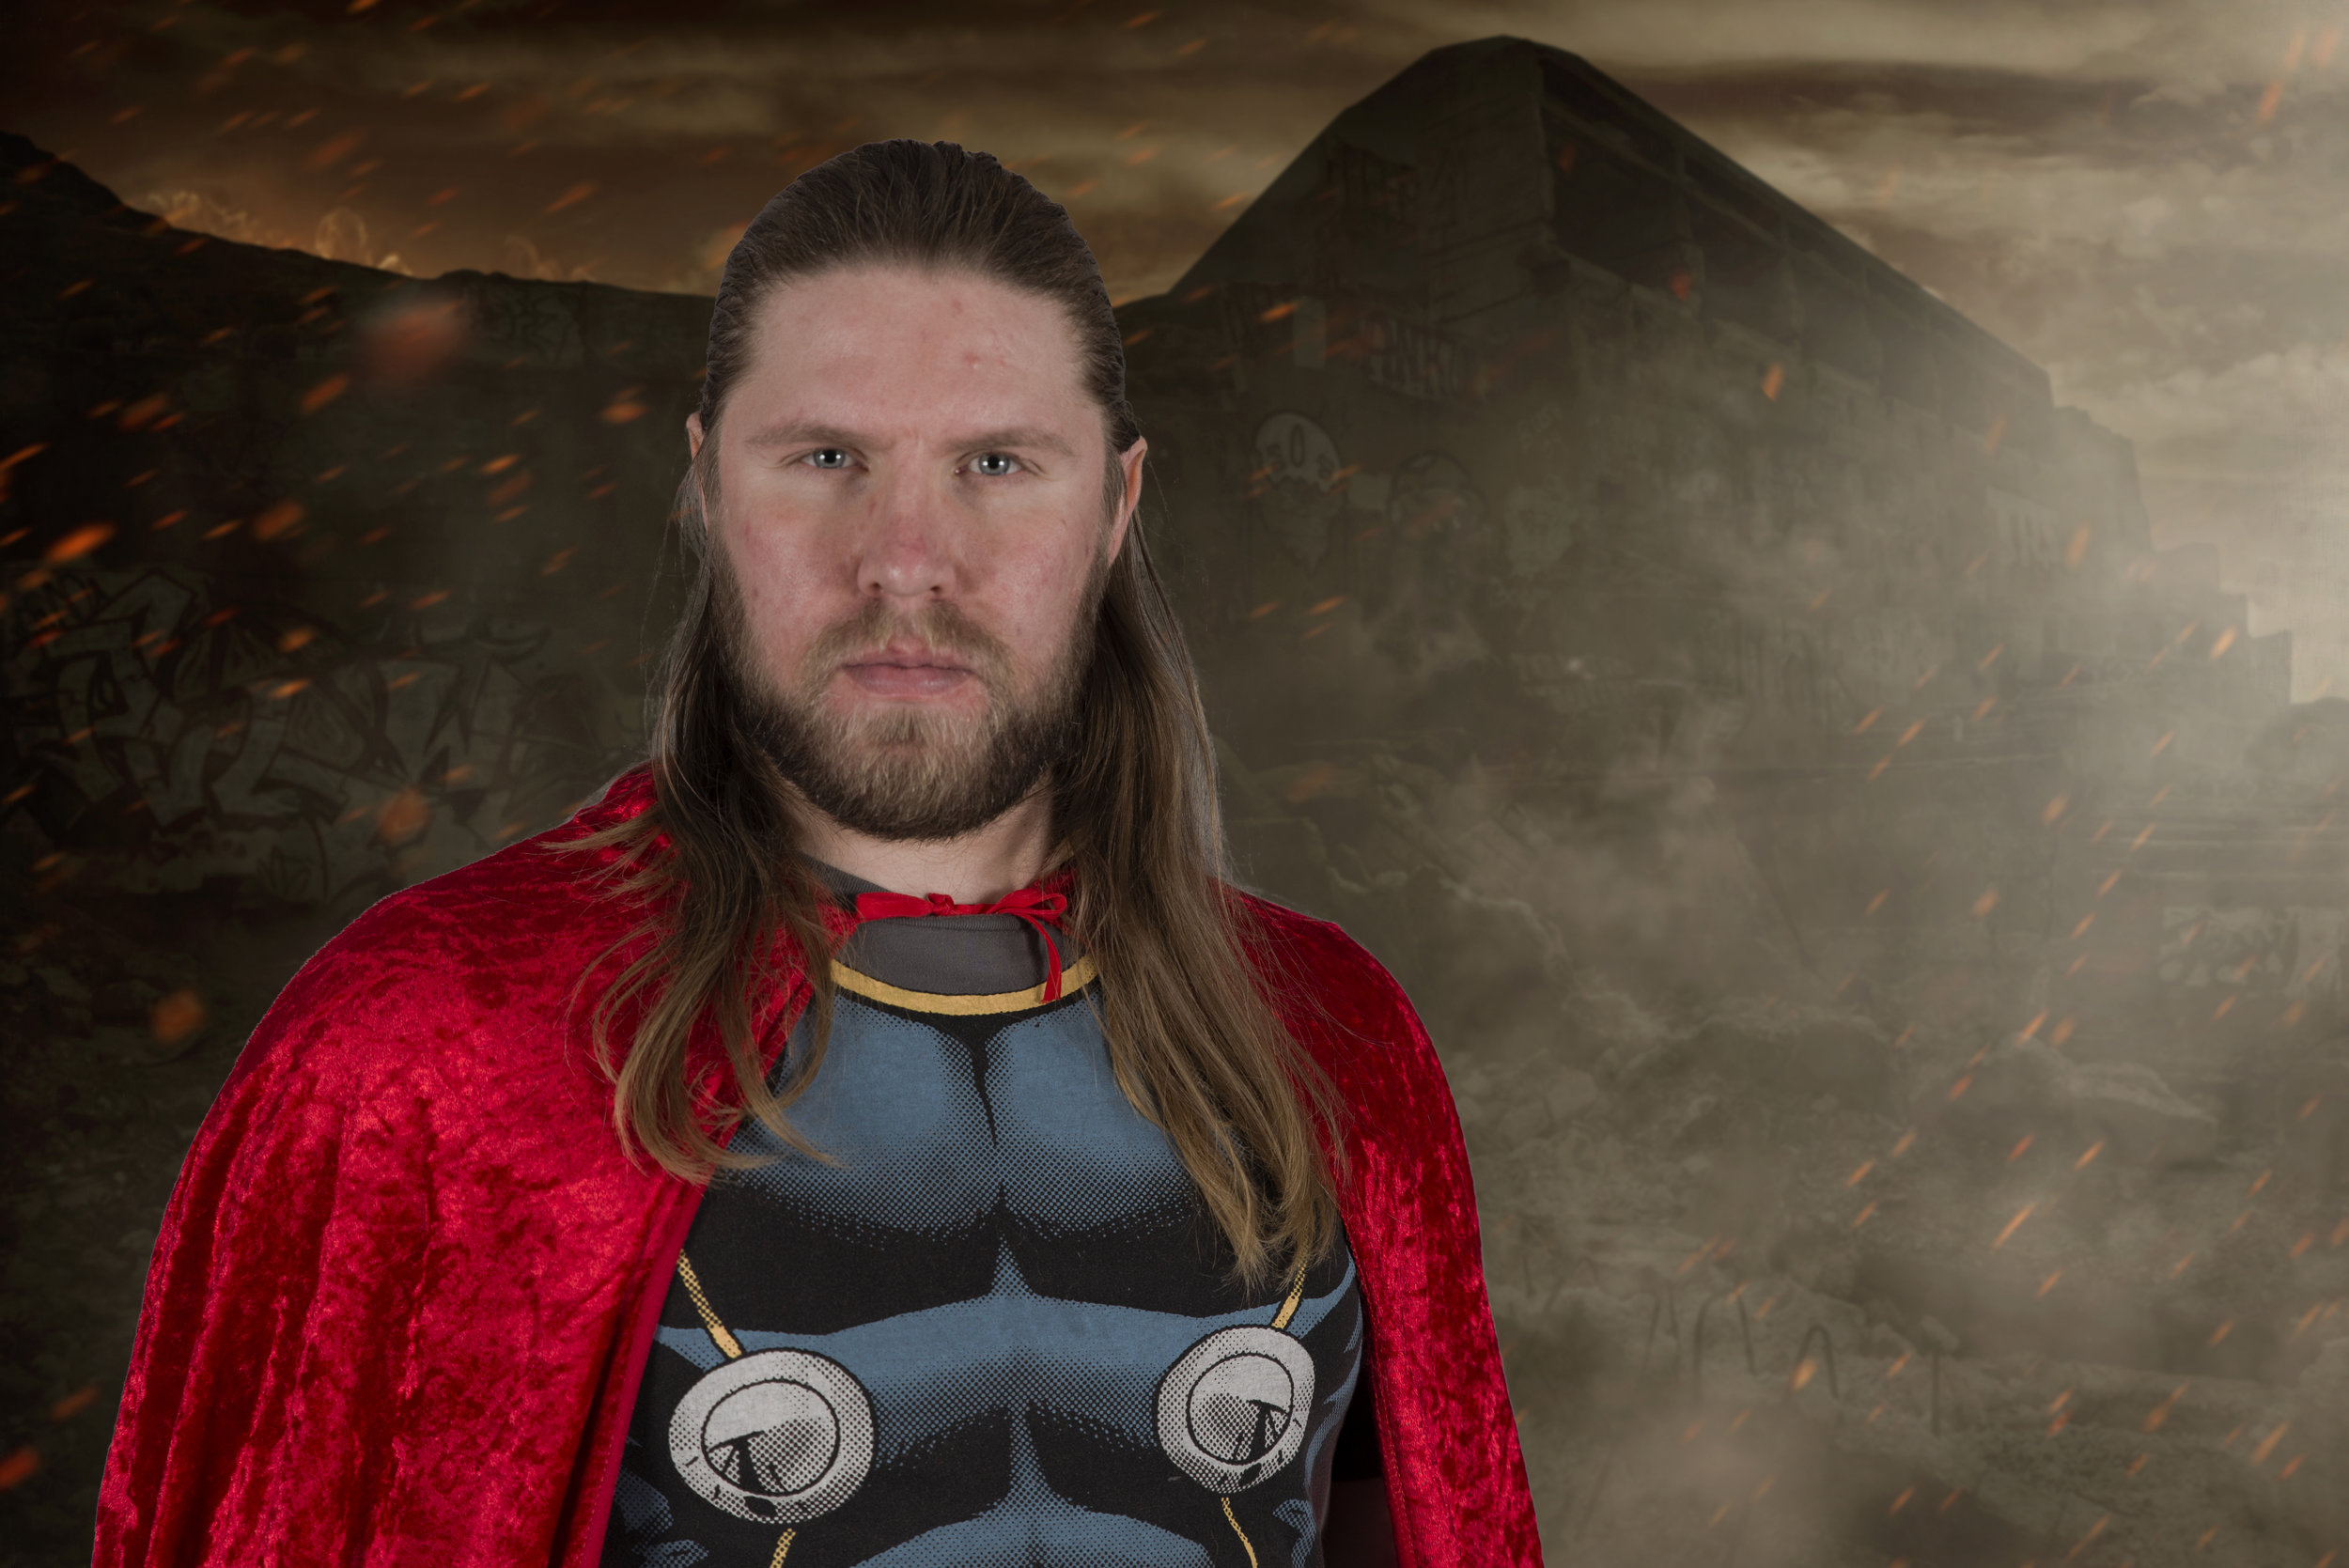 Thor-portrait-session3.jpg